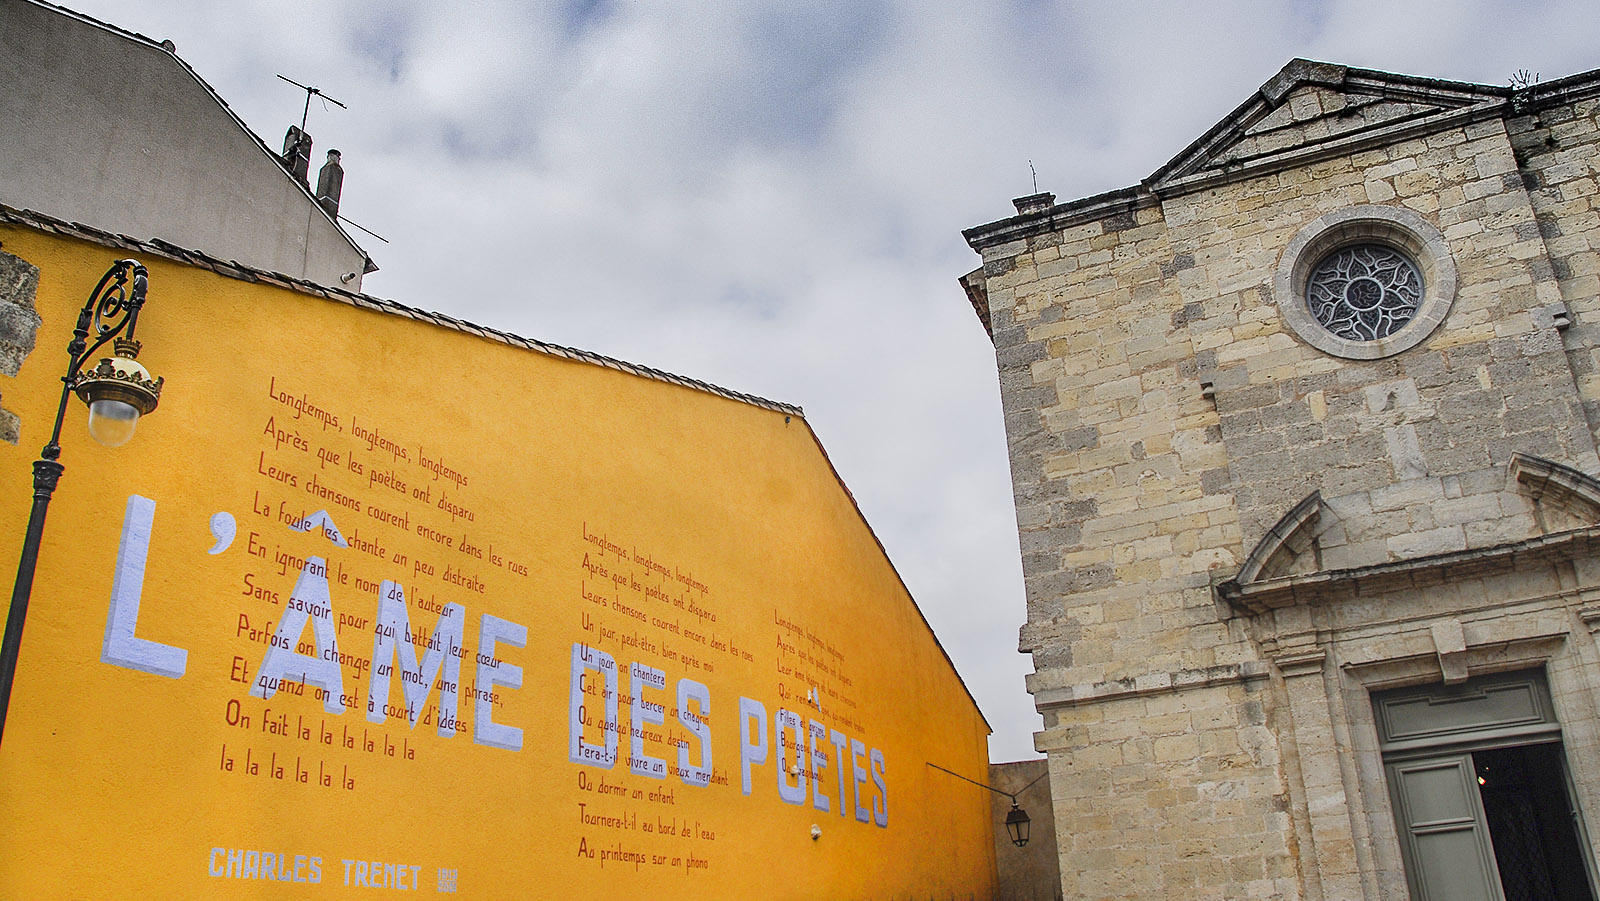 Narbonne: Ein Wandbild erinnert an Charles Trenet. Foto: Hilke Maunder